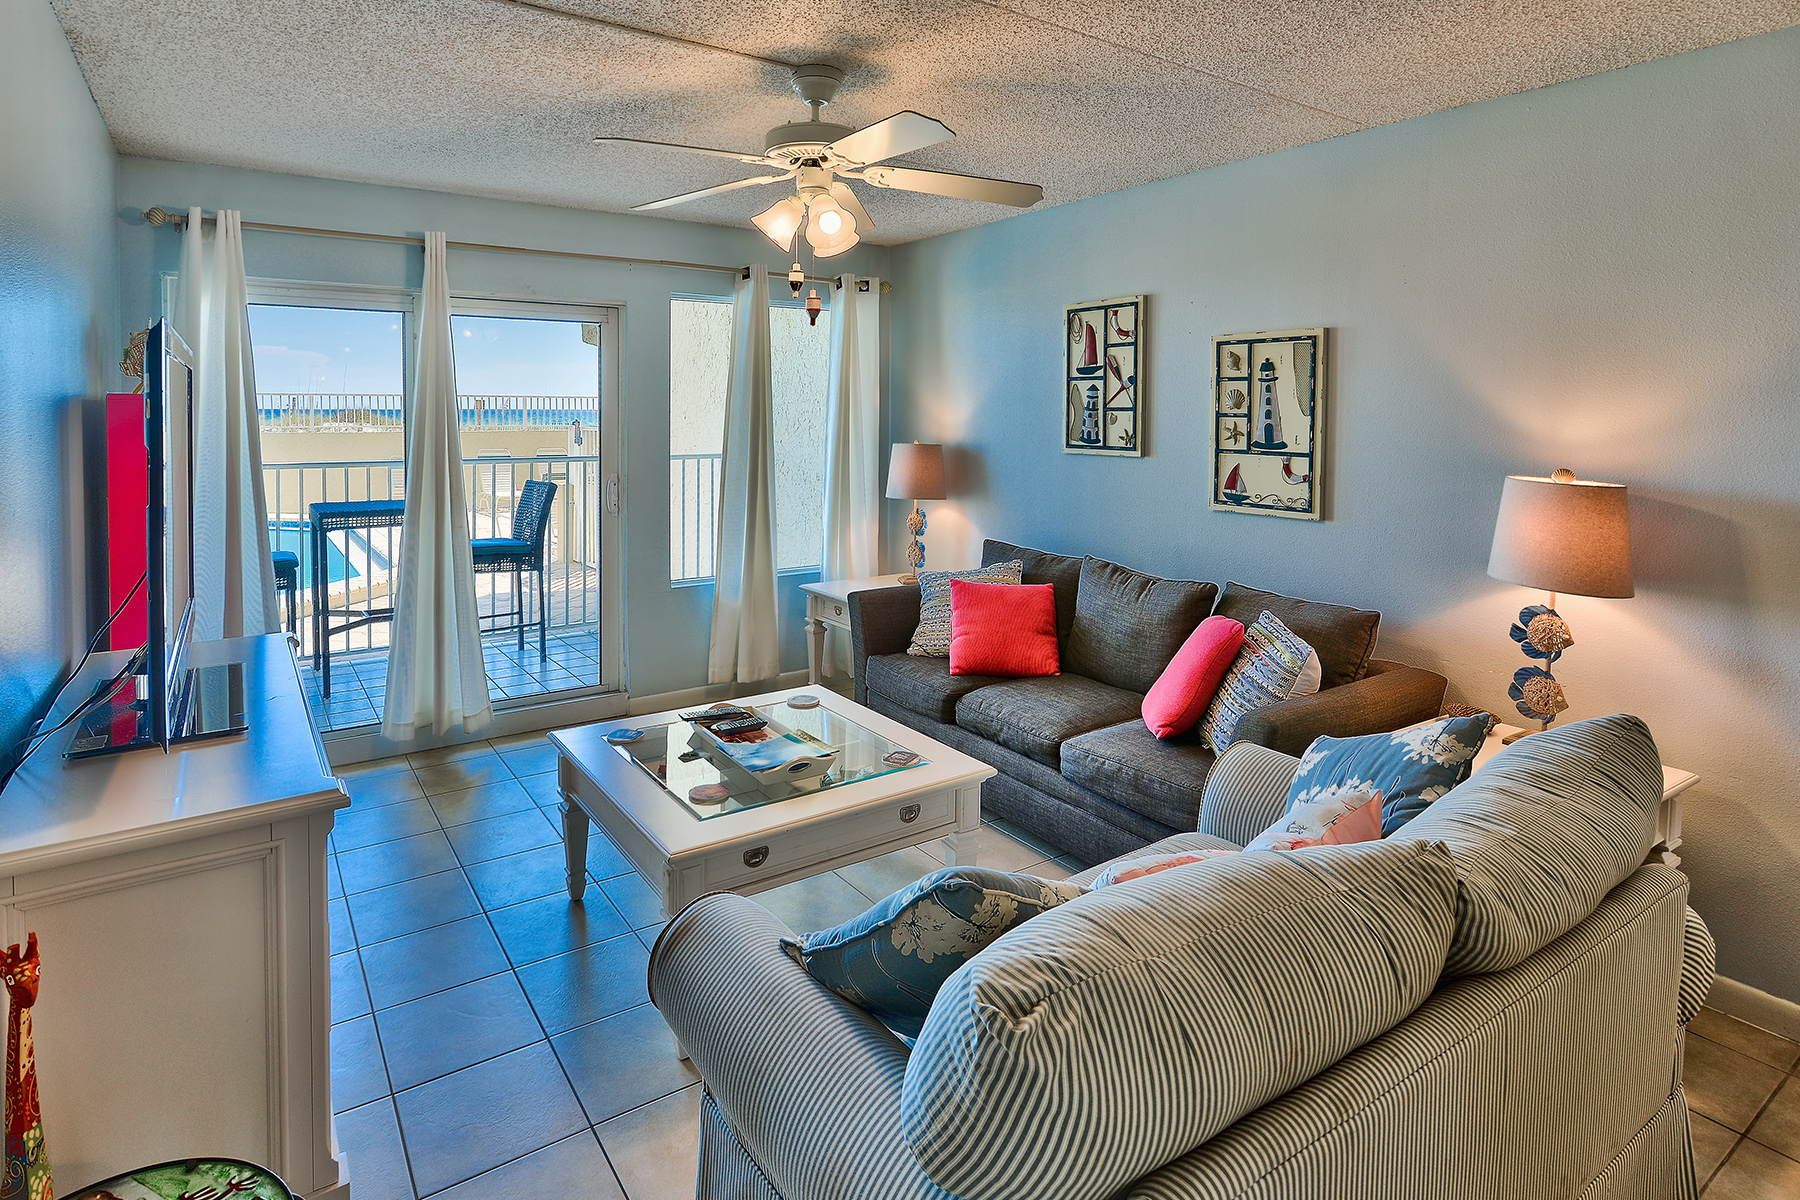 Condominium for Sale at GROUND FLOOR GULF FRONT CONDO ON OKALOOSA ISLAND 676 Santa Rosa Boulevard 1L Fort Walton Beach, Florida 32548 United States